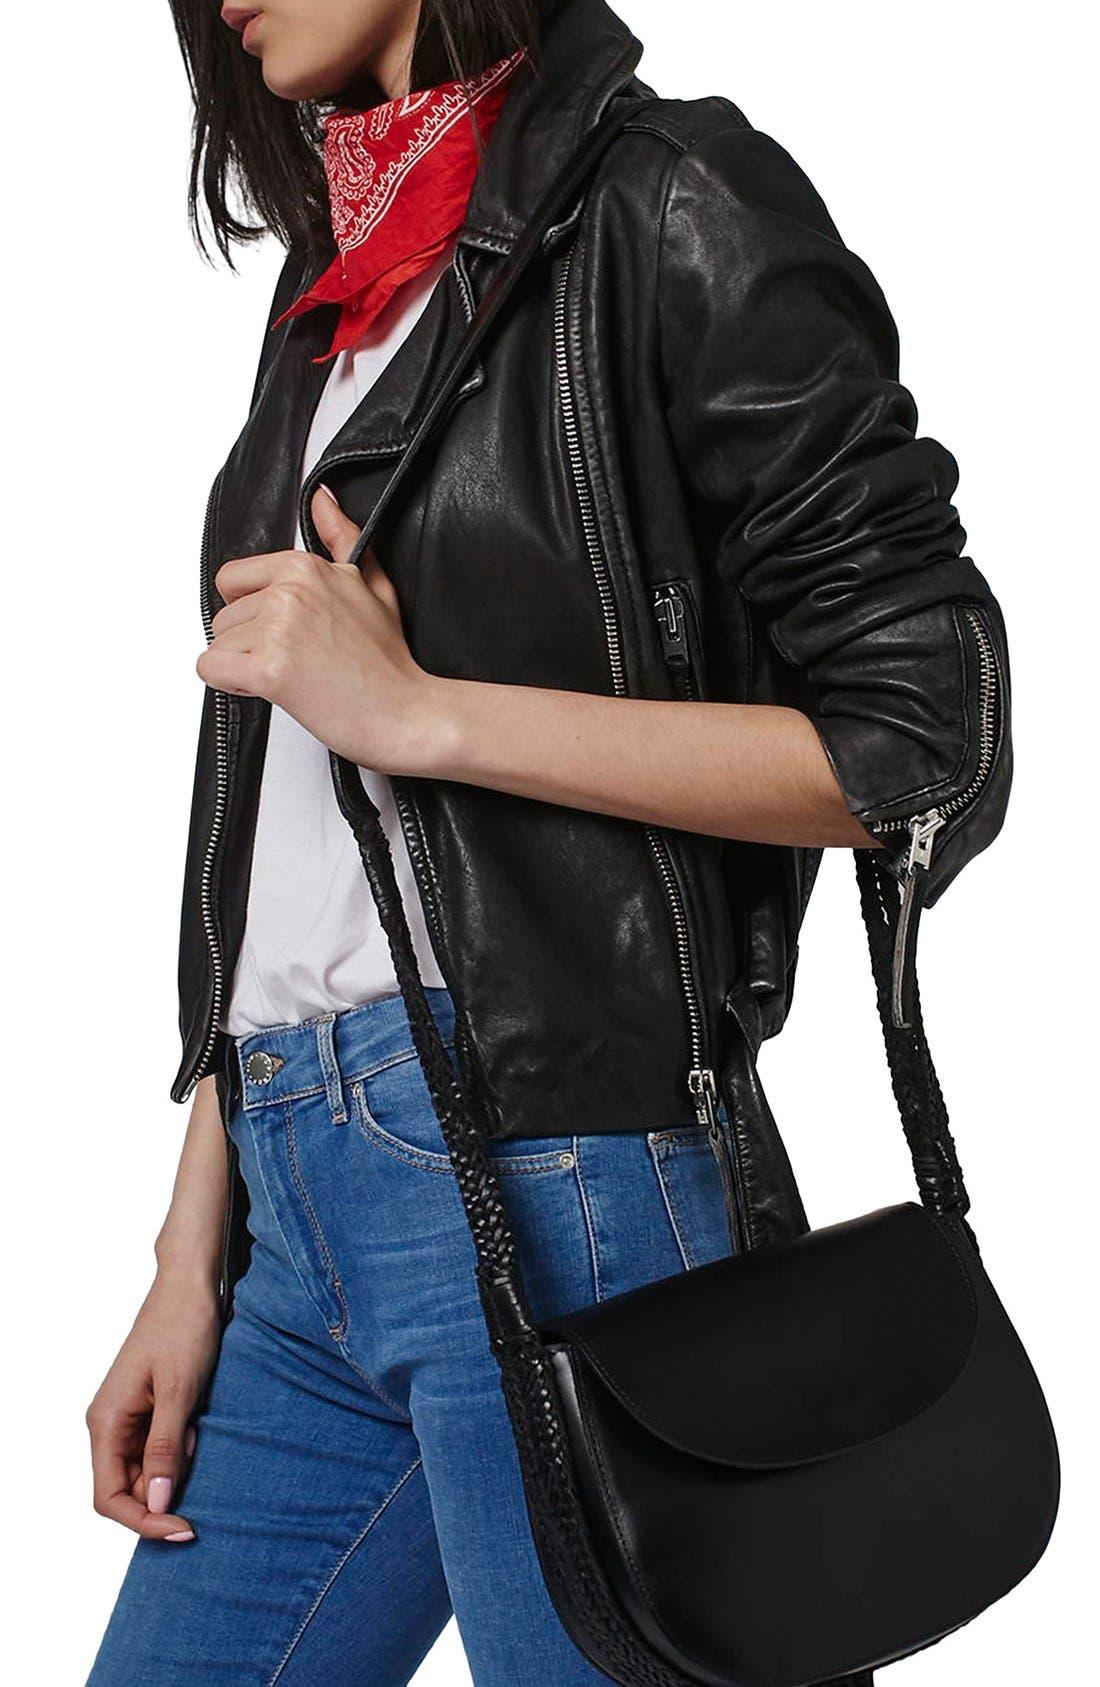 TOPSHOP, Woven Strap Leather Saddle Bag, Alternate thumbnail 3, color, 001